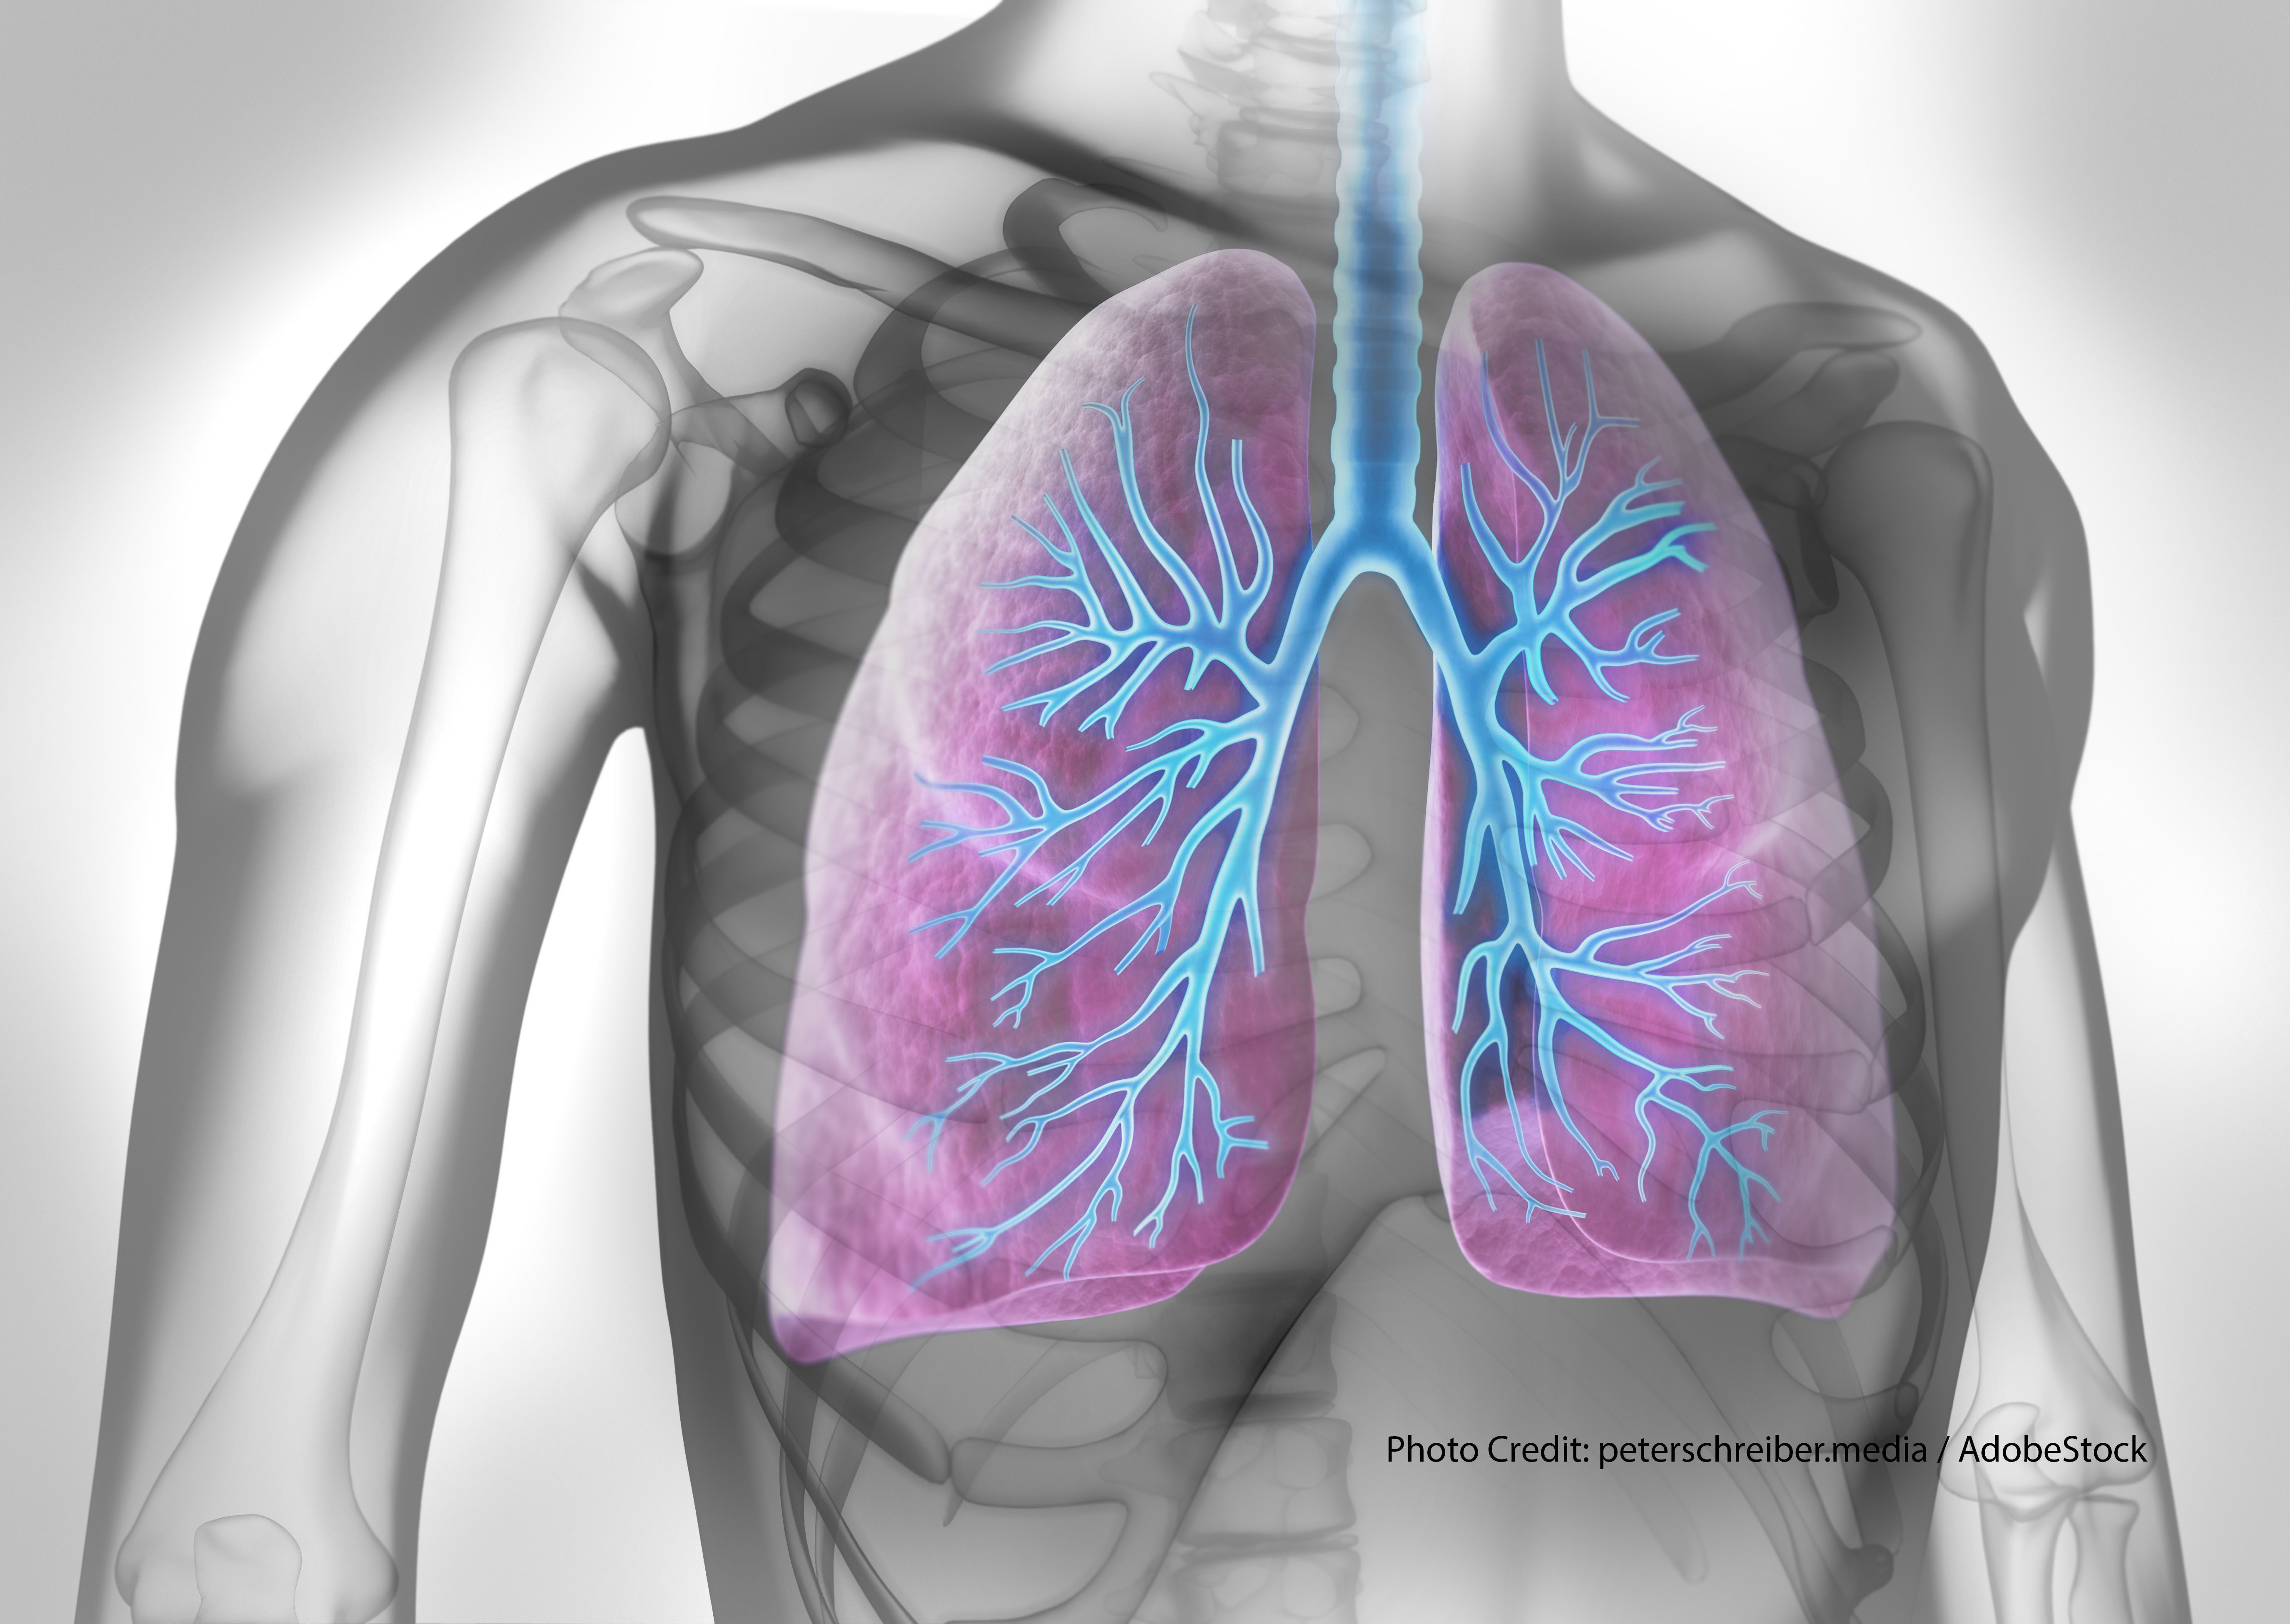 Managing COPD patients